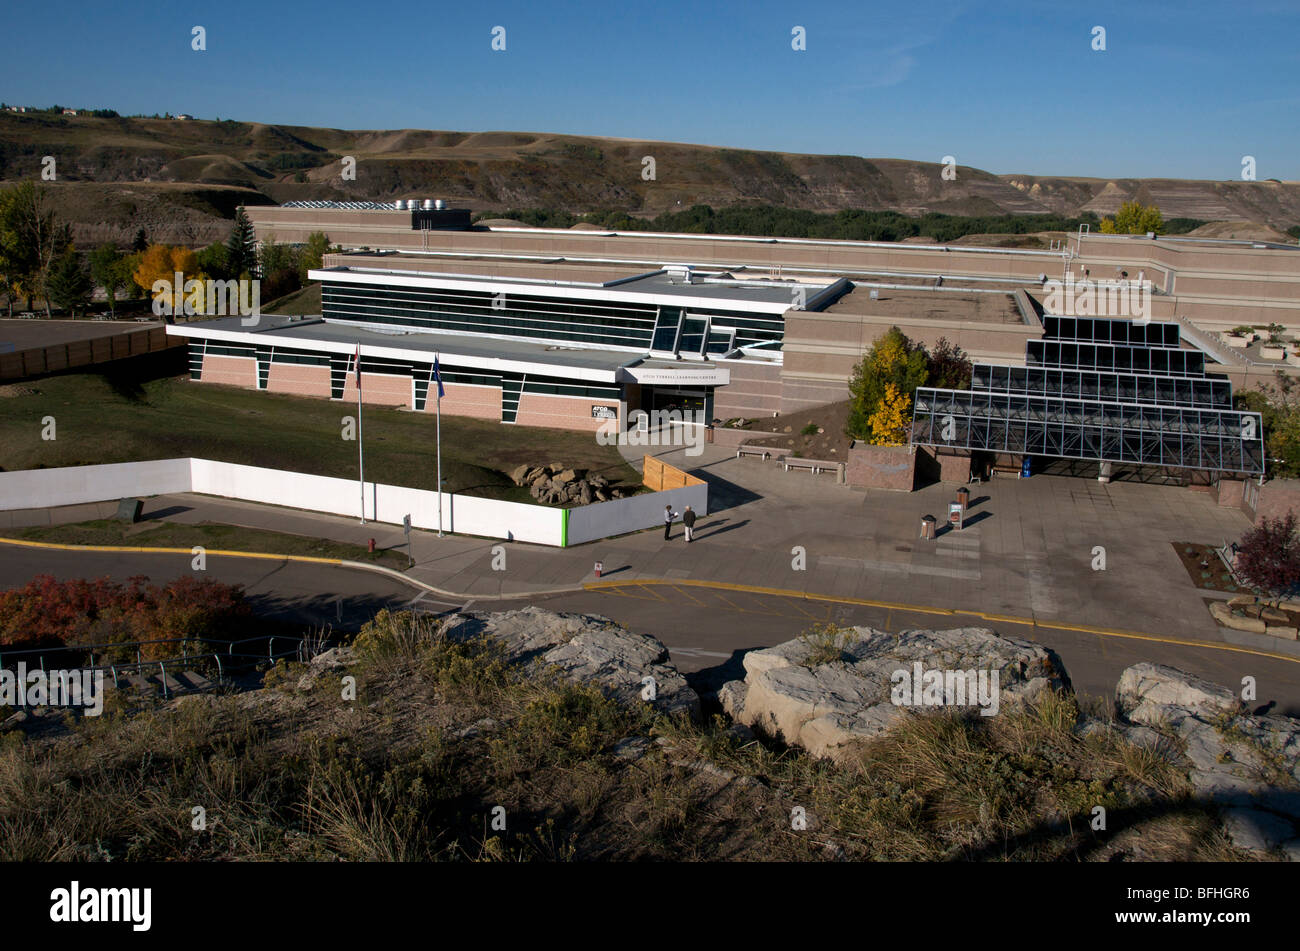 Royal Tyrrell Museum, Dinosaur/palaeontology.  Drumheller, Alberta, Canada - Stock Image